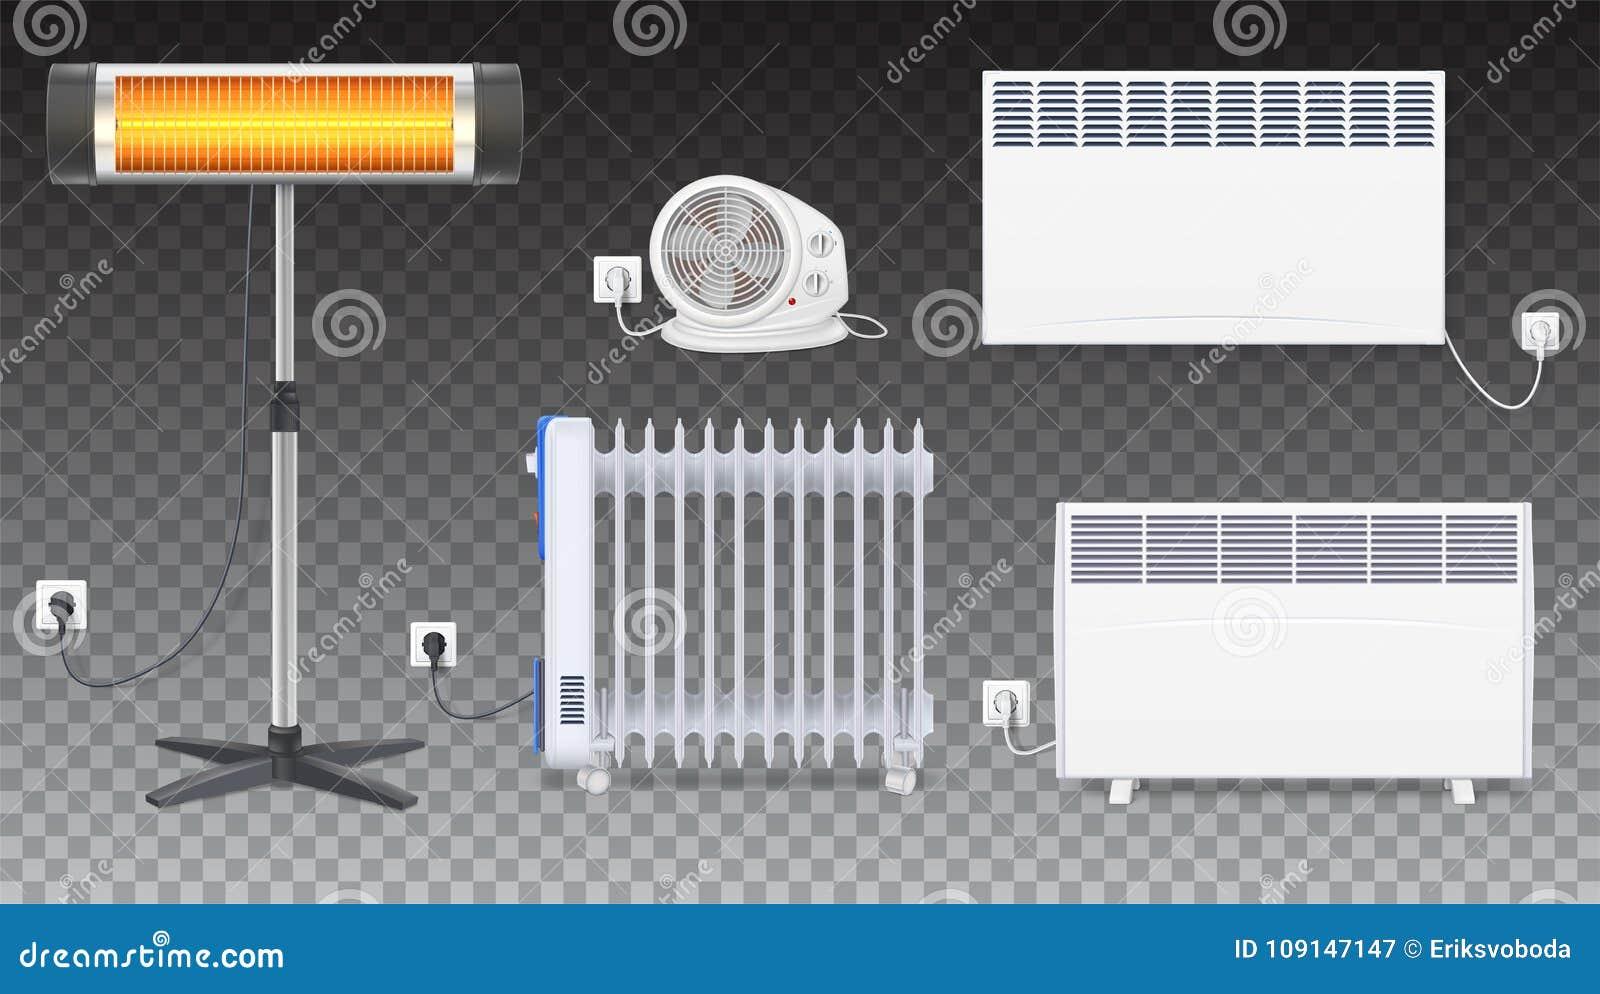 lampe mit ventilator finest lampe mit ventilator with. Black Bedroom Furniture Sets. Home Design Ideas